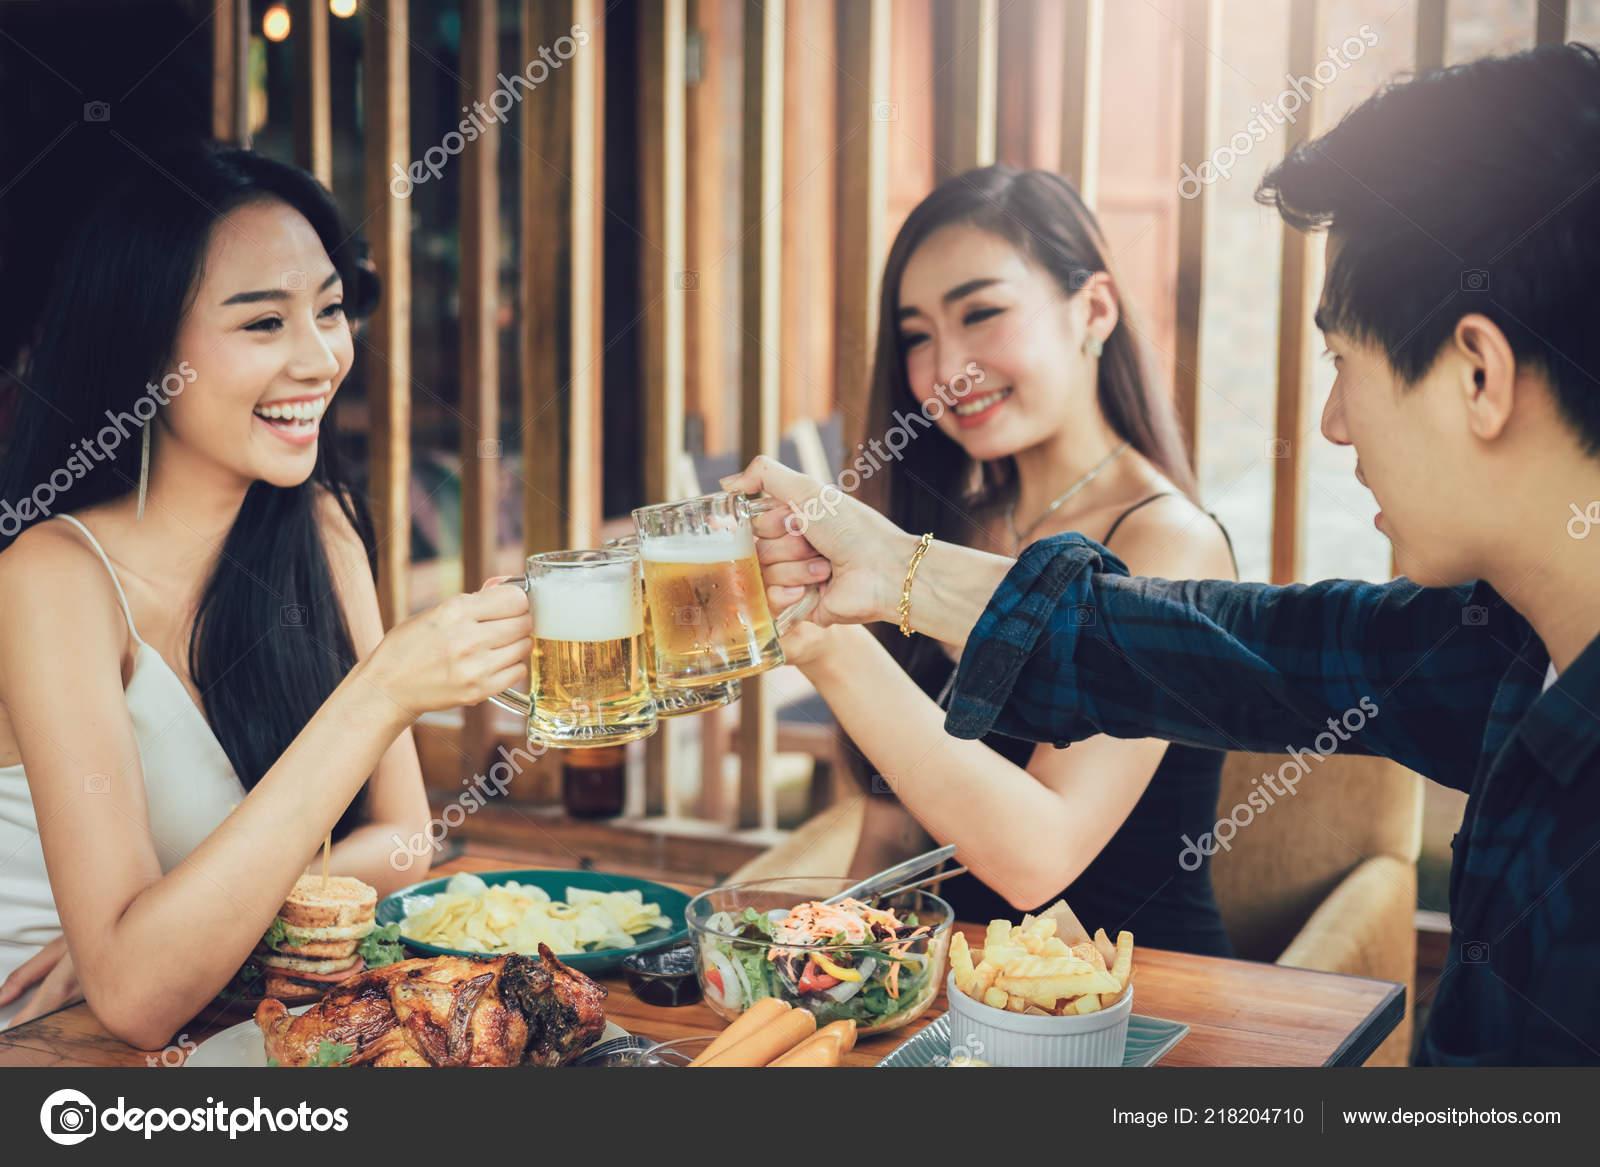 Fun teen restaurants